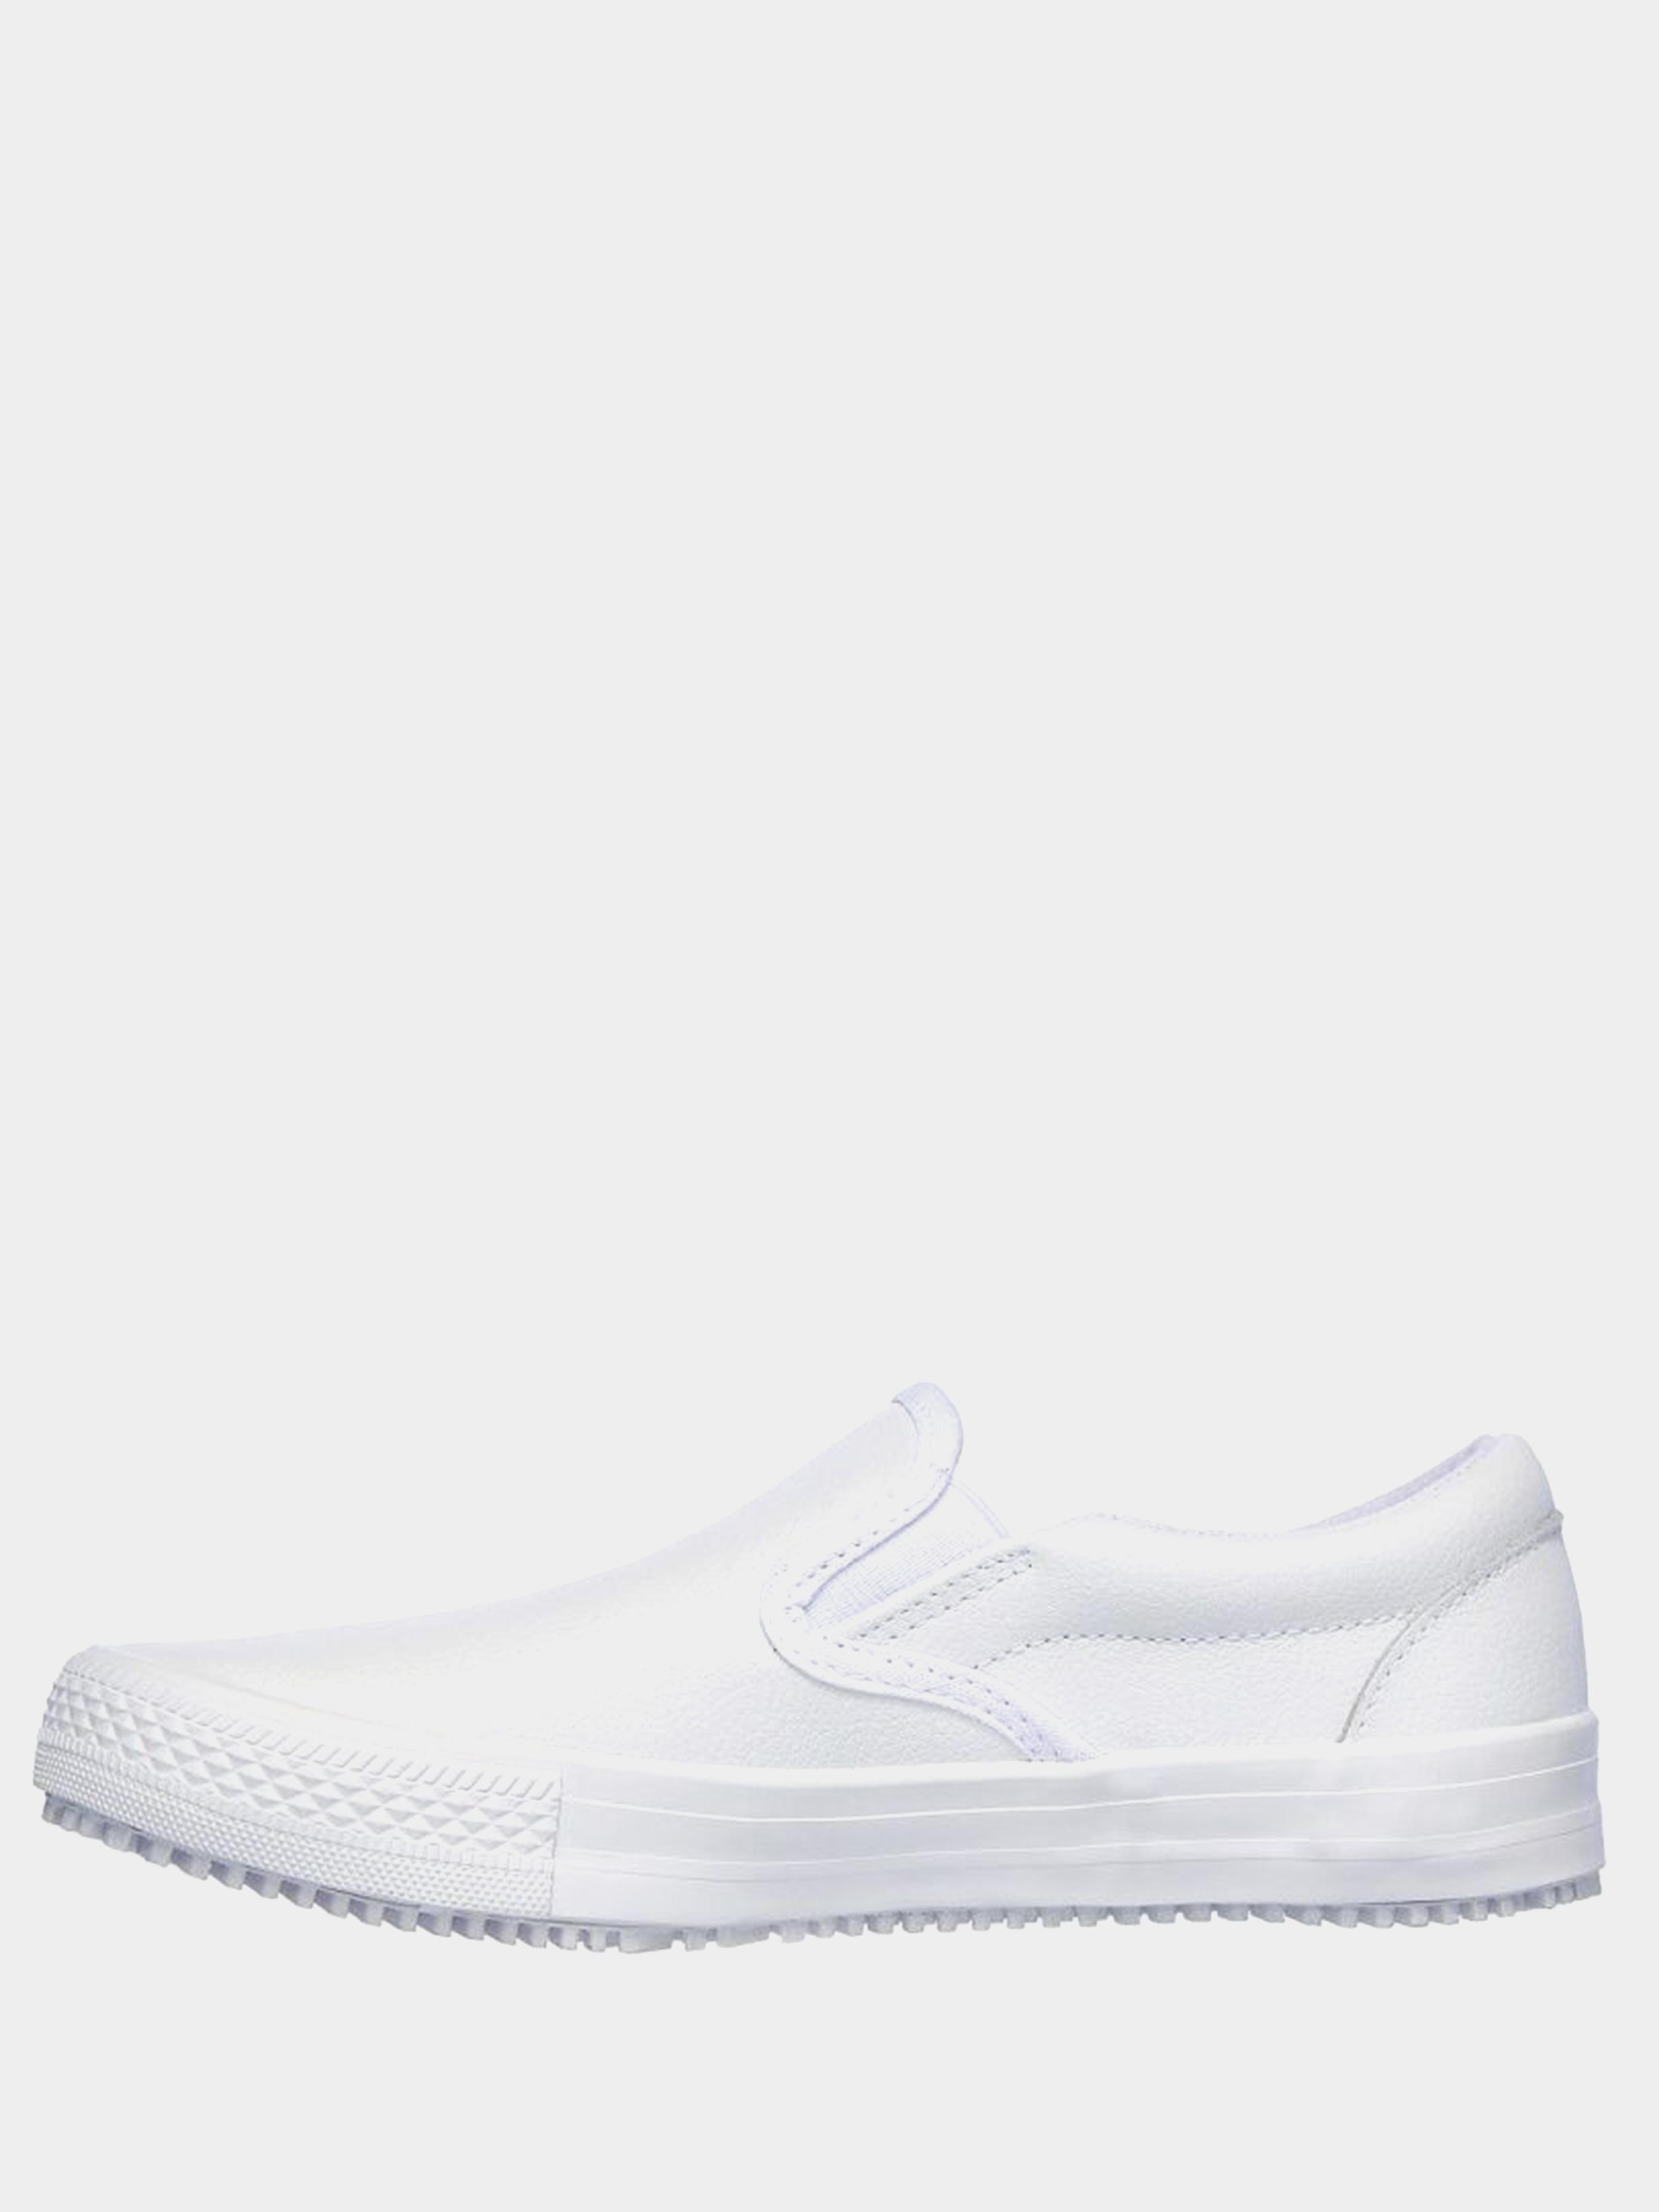 Cлипоны для женщин Skechers KW5281 размеры обуви, 2017